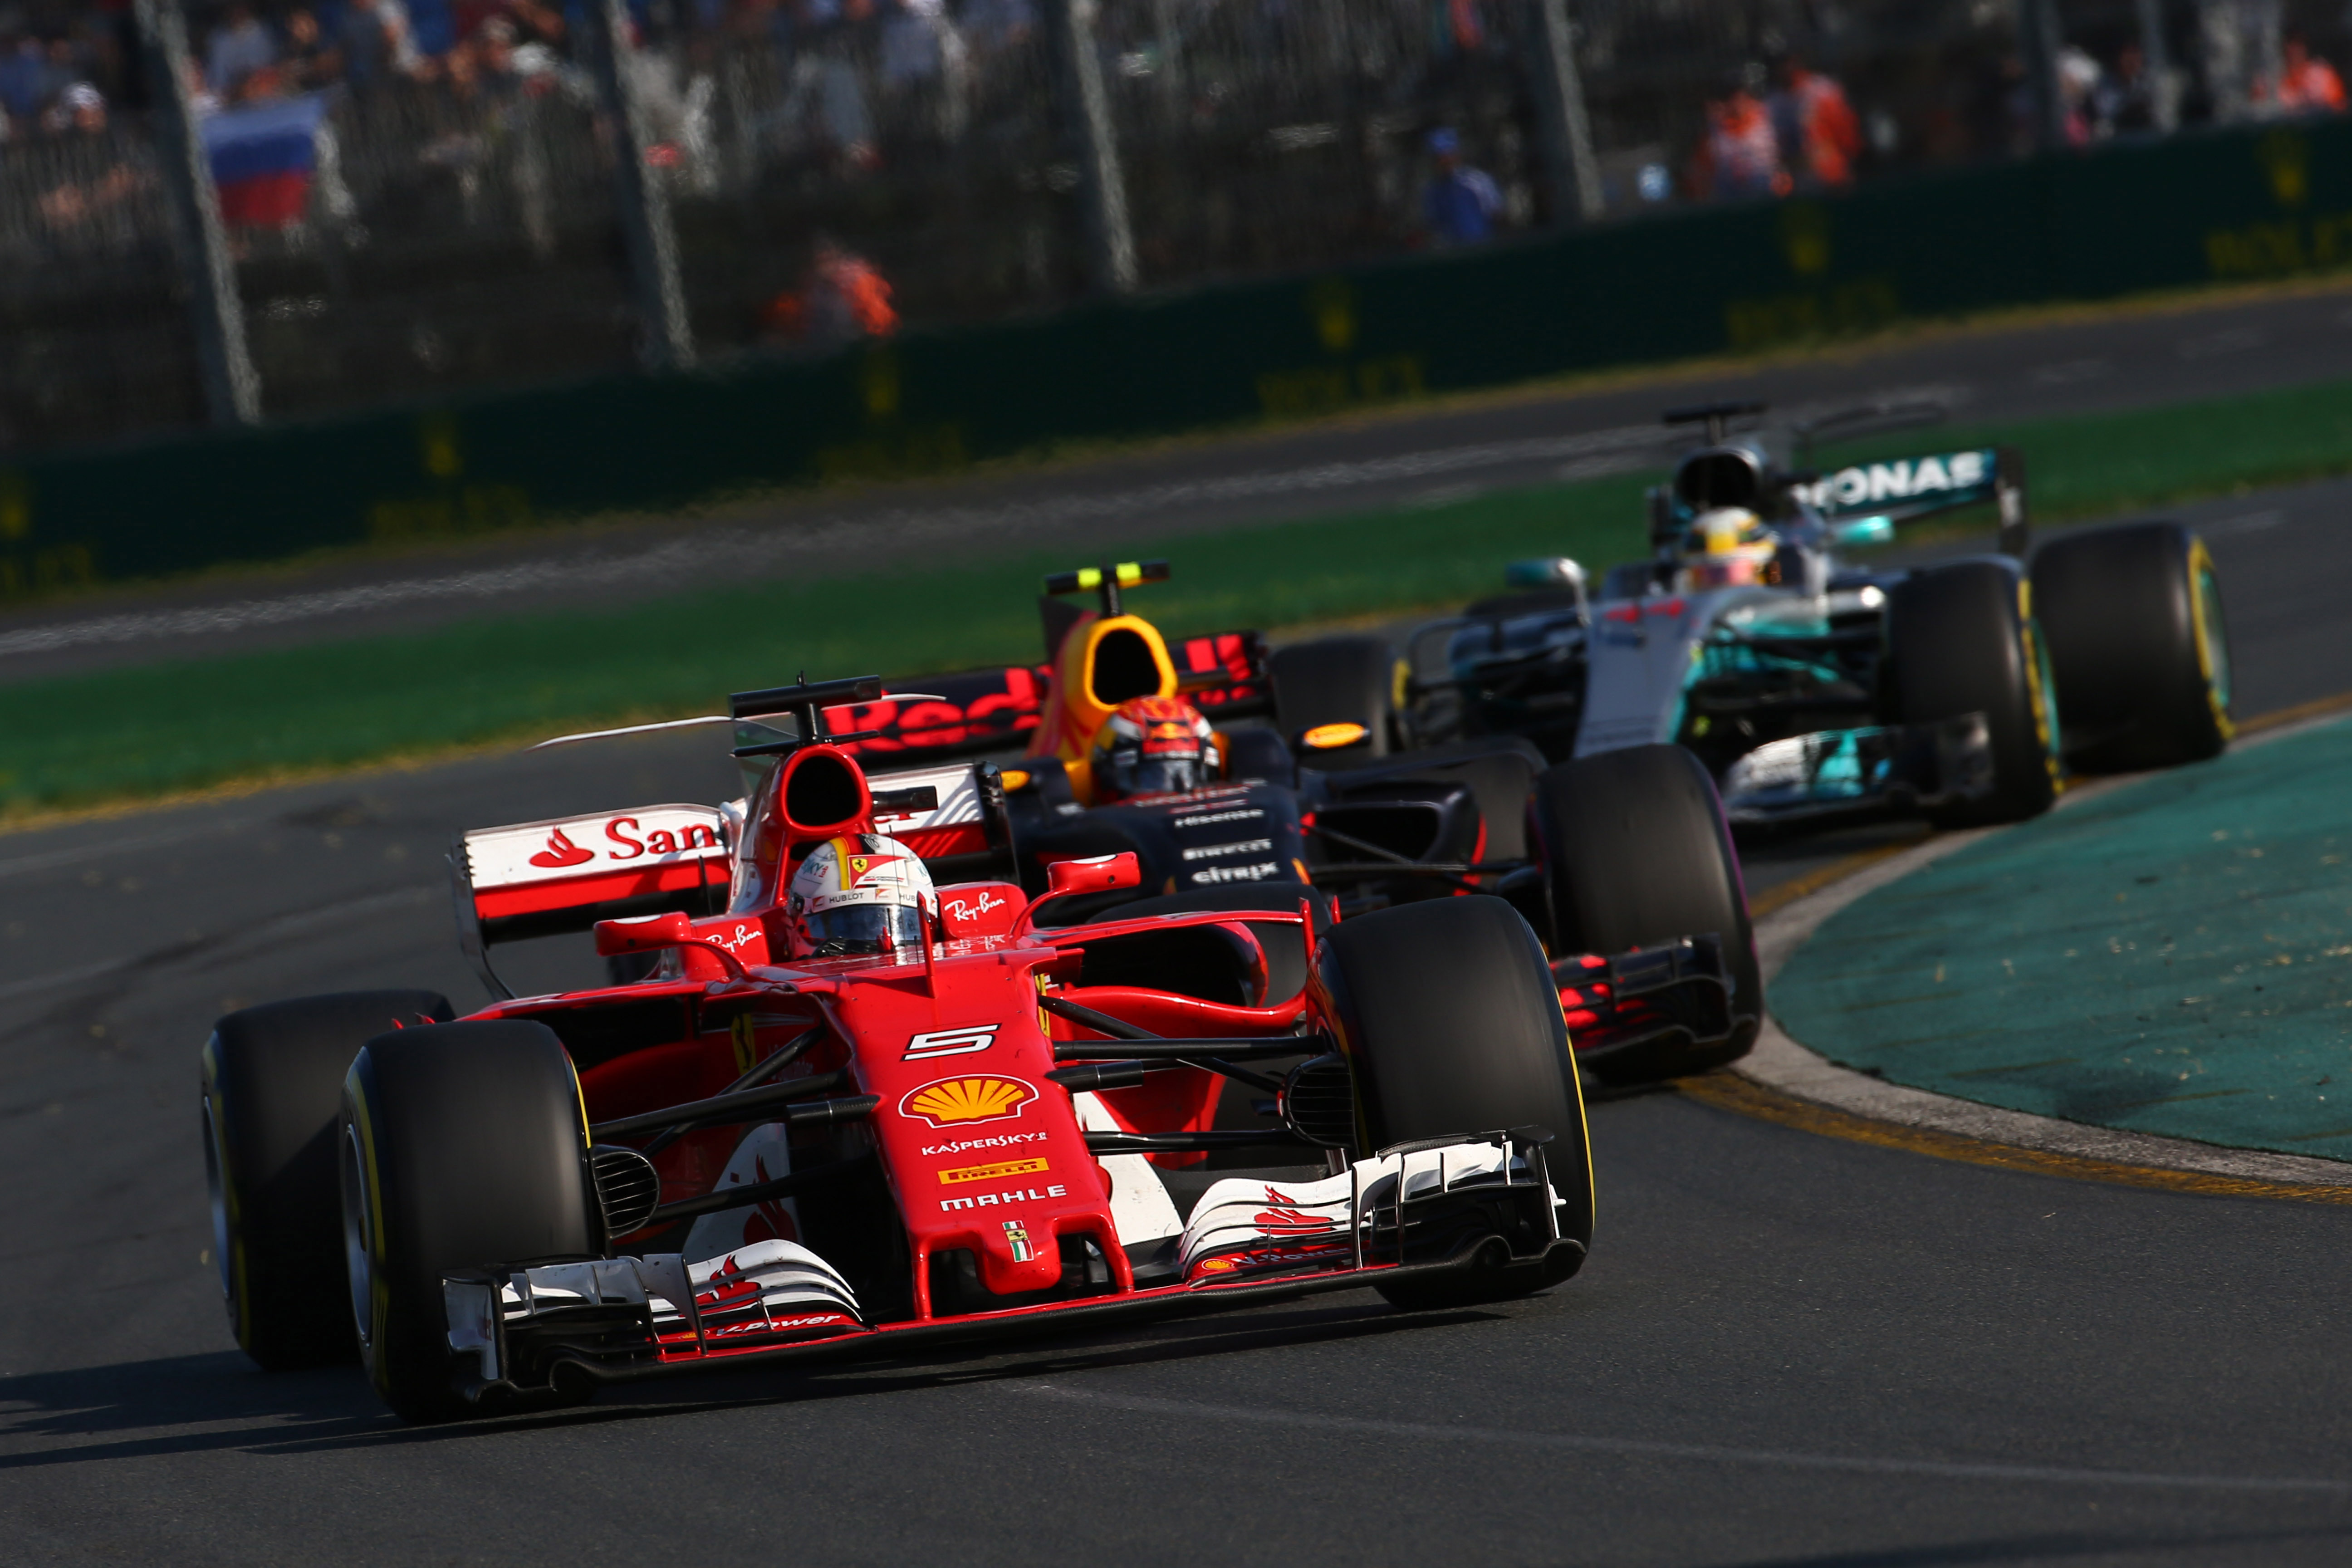 wallpapers australian grand prix of 2017 marcos formula